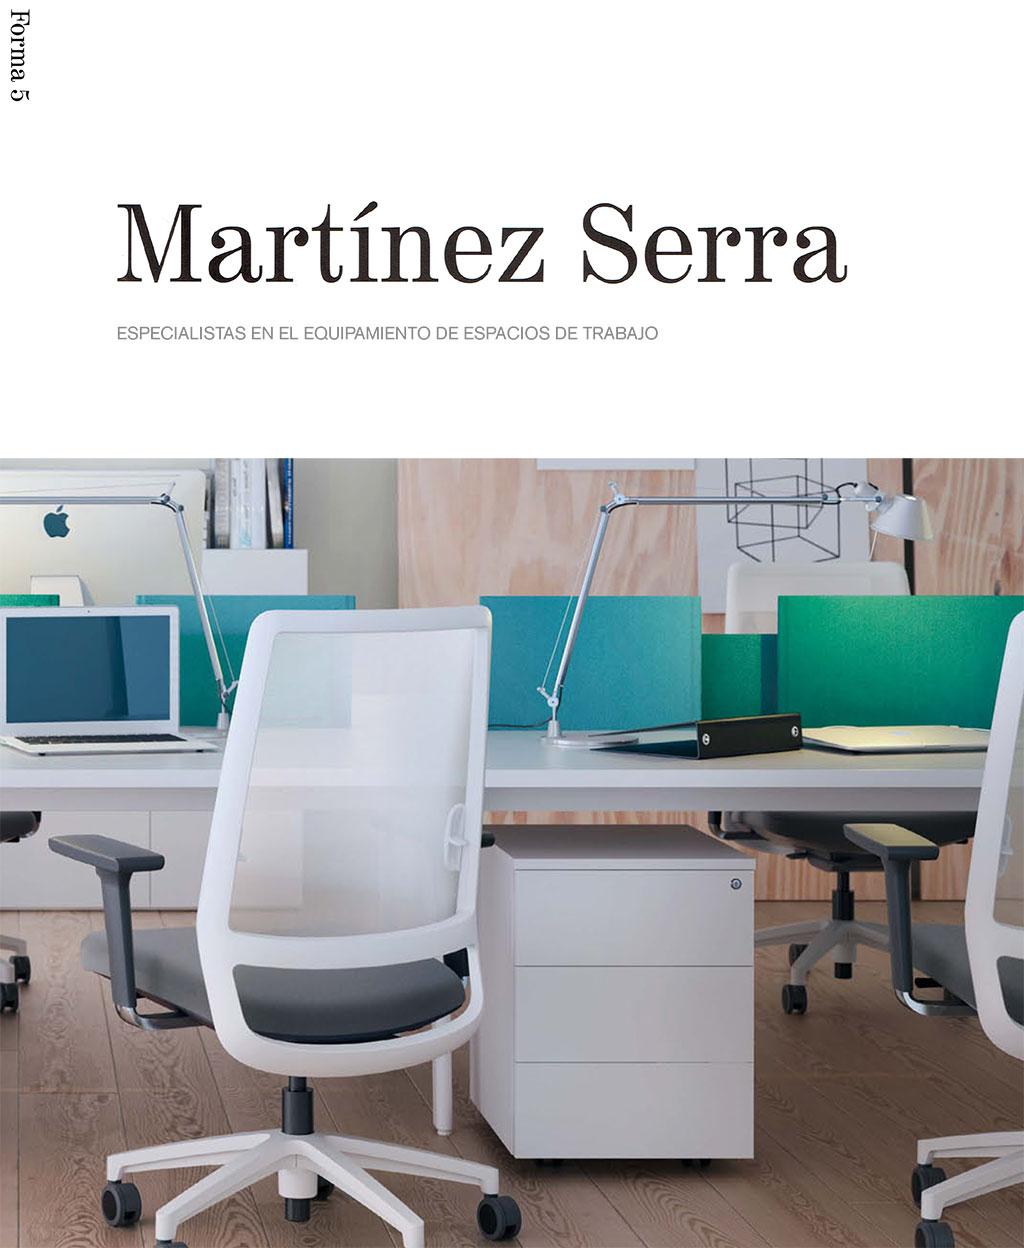 Revista Martinez Serra